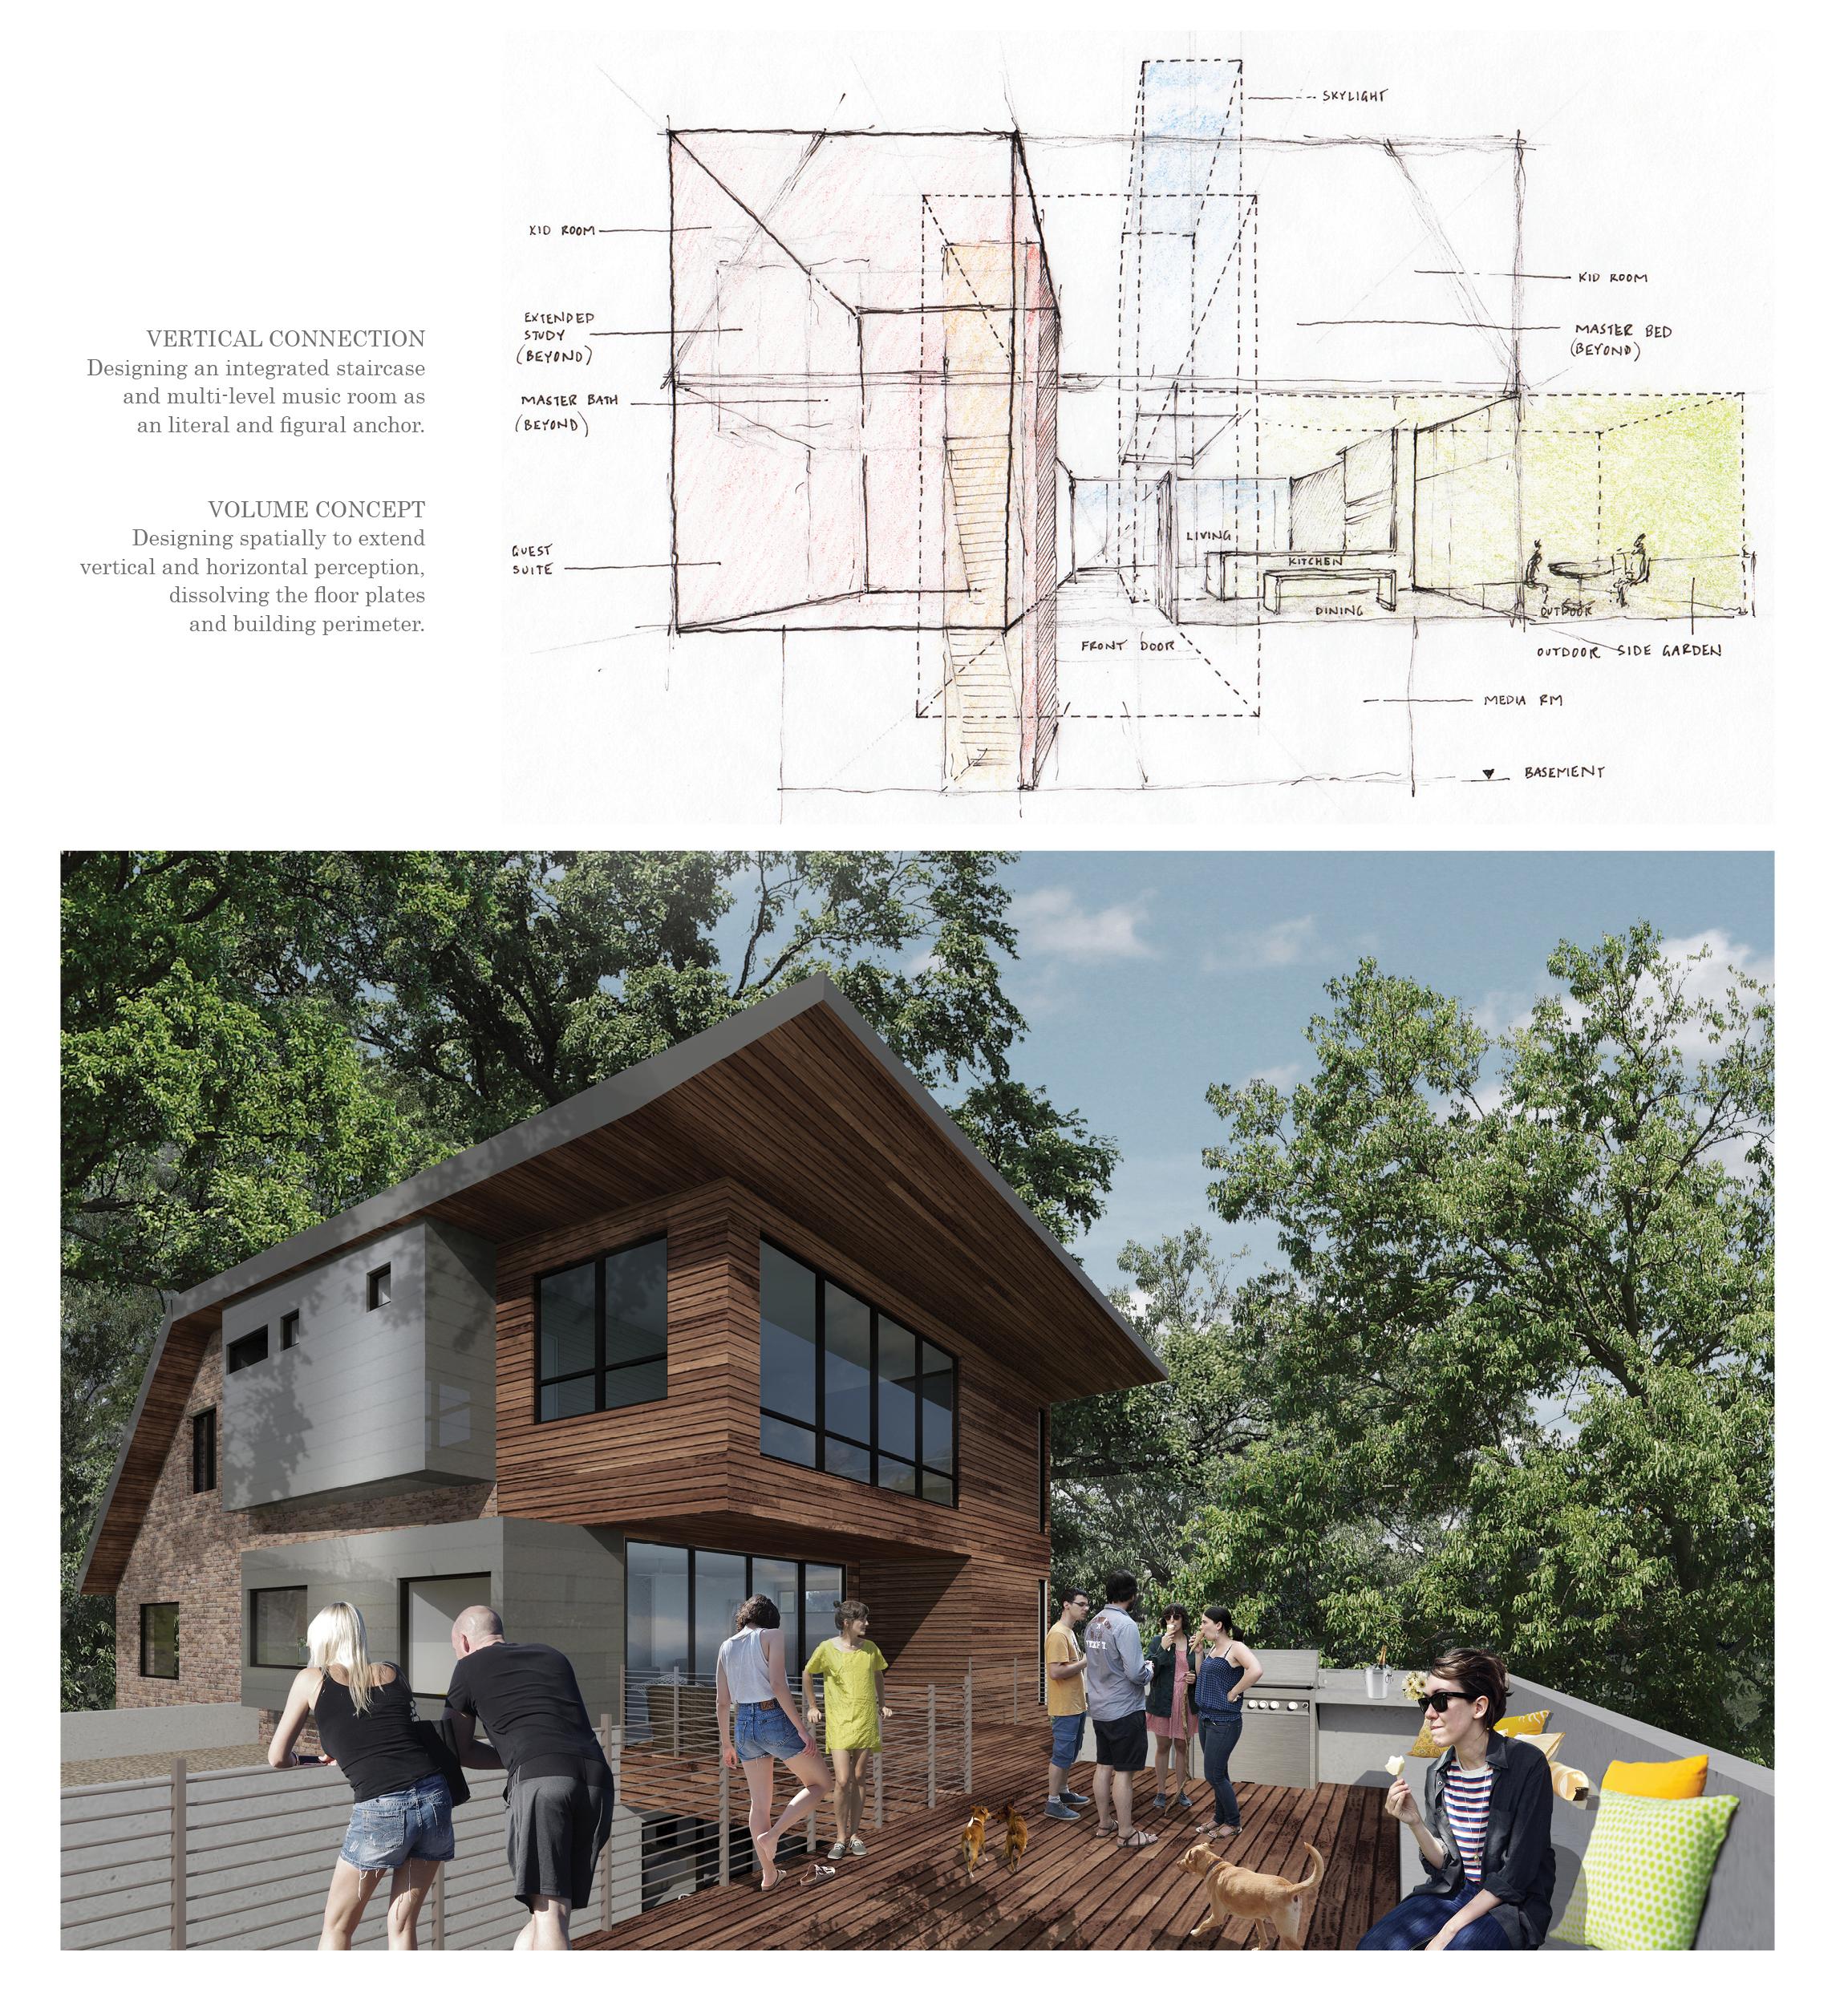 Mullet House by Matt Fajkus Architecture - Sketch+Render.jpg